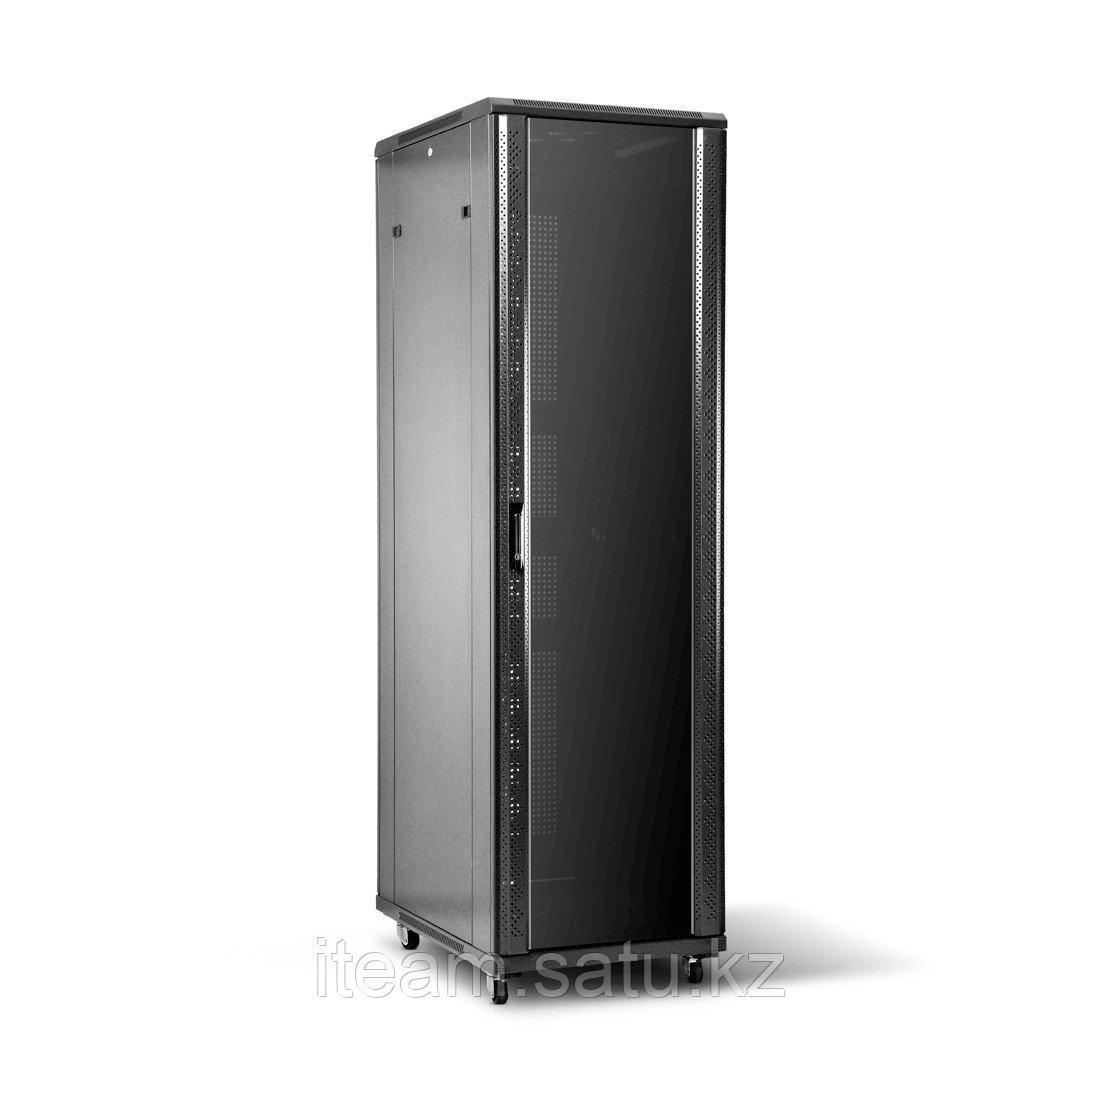 Шкаф серверный SHIP 601S.8047.24.100 47U, 800*1000*2200 мм